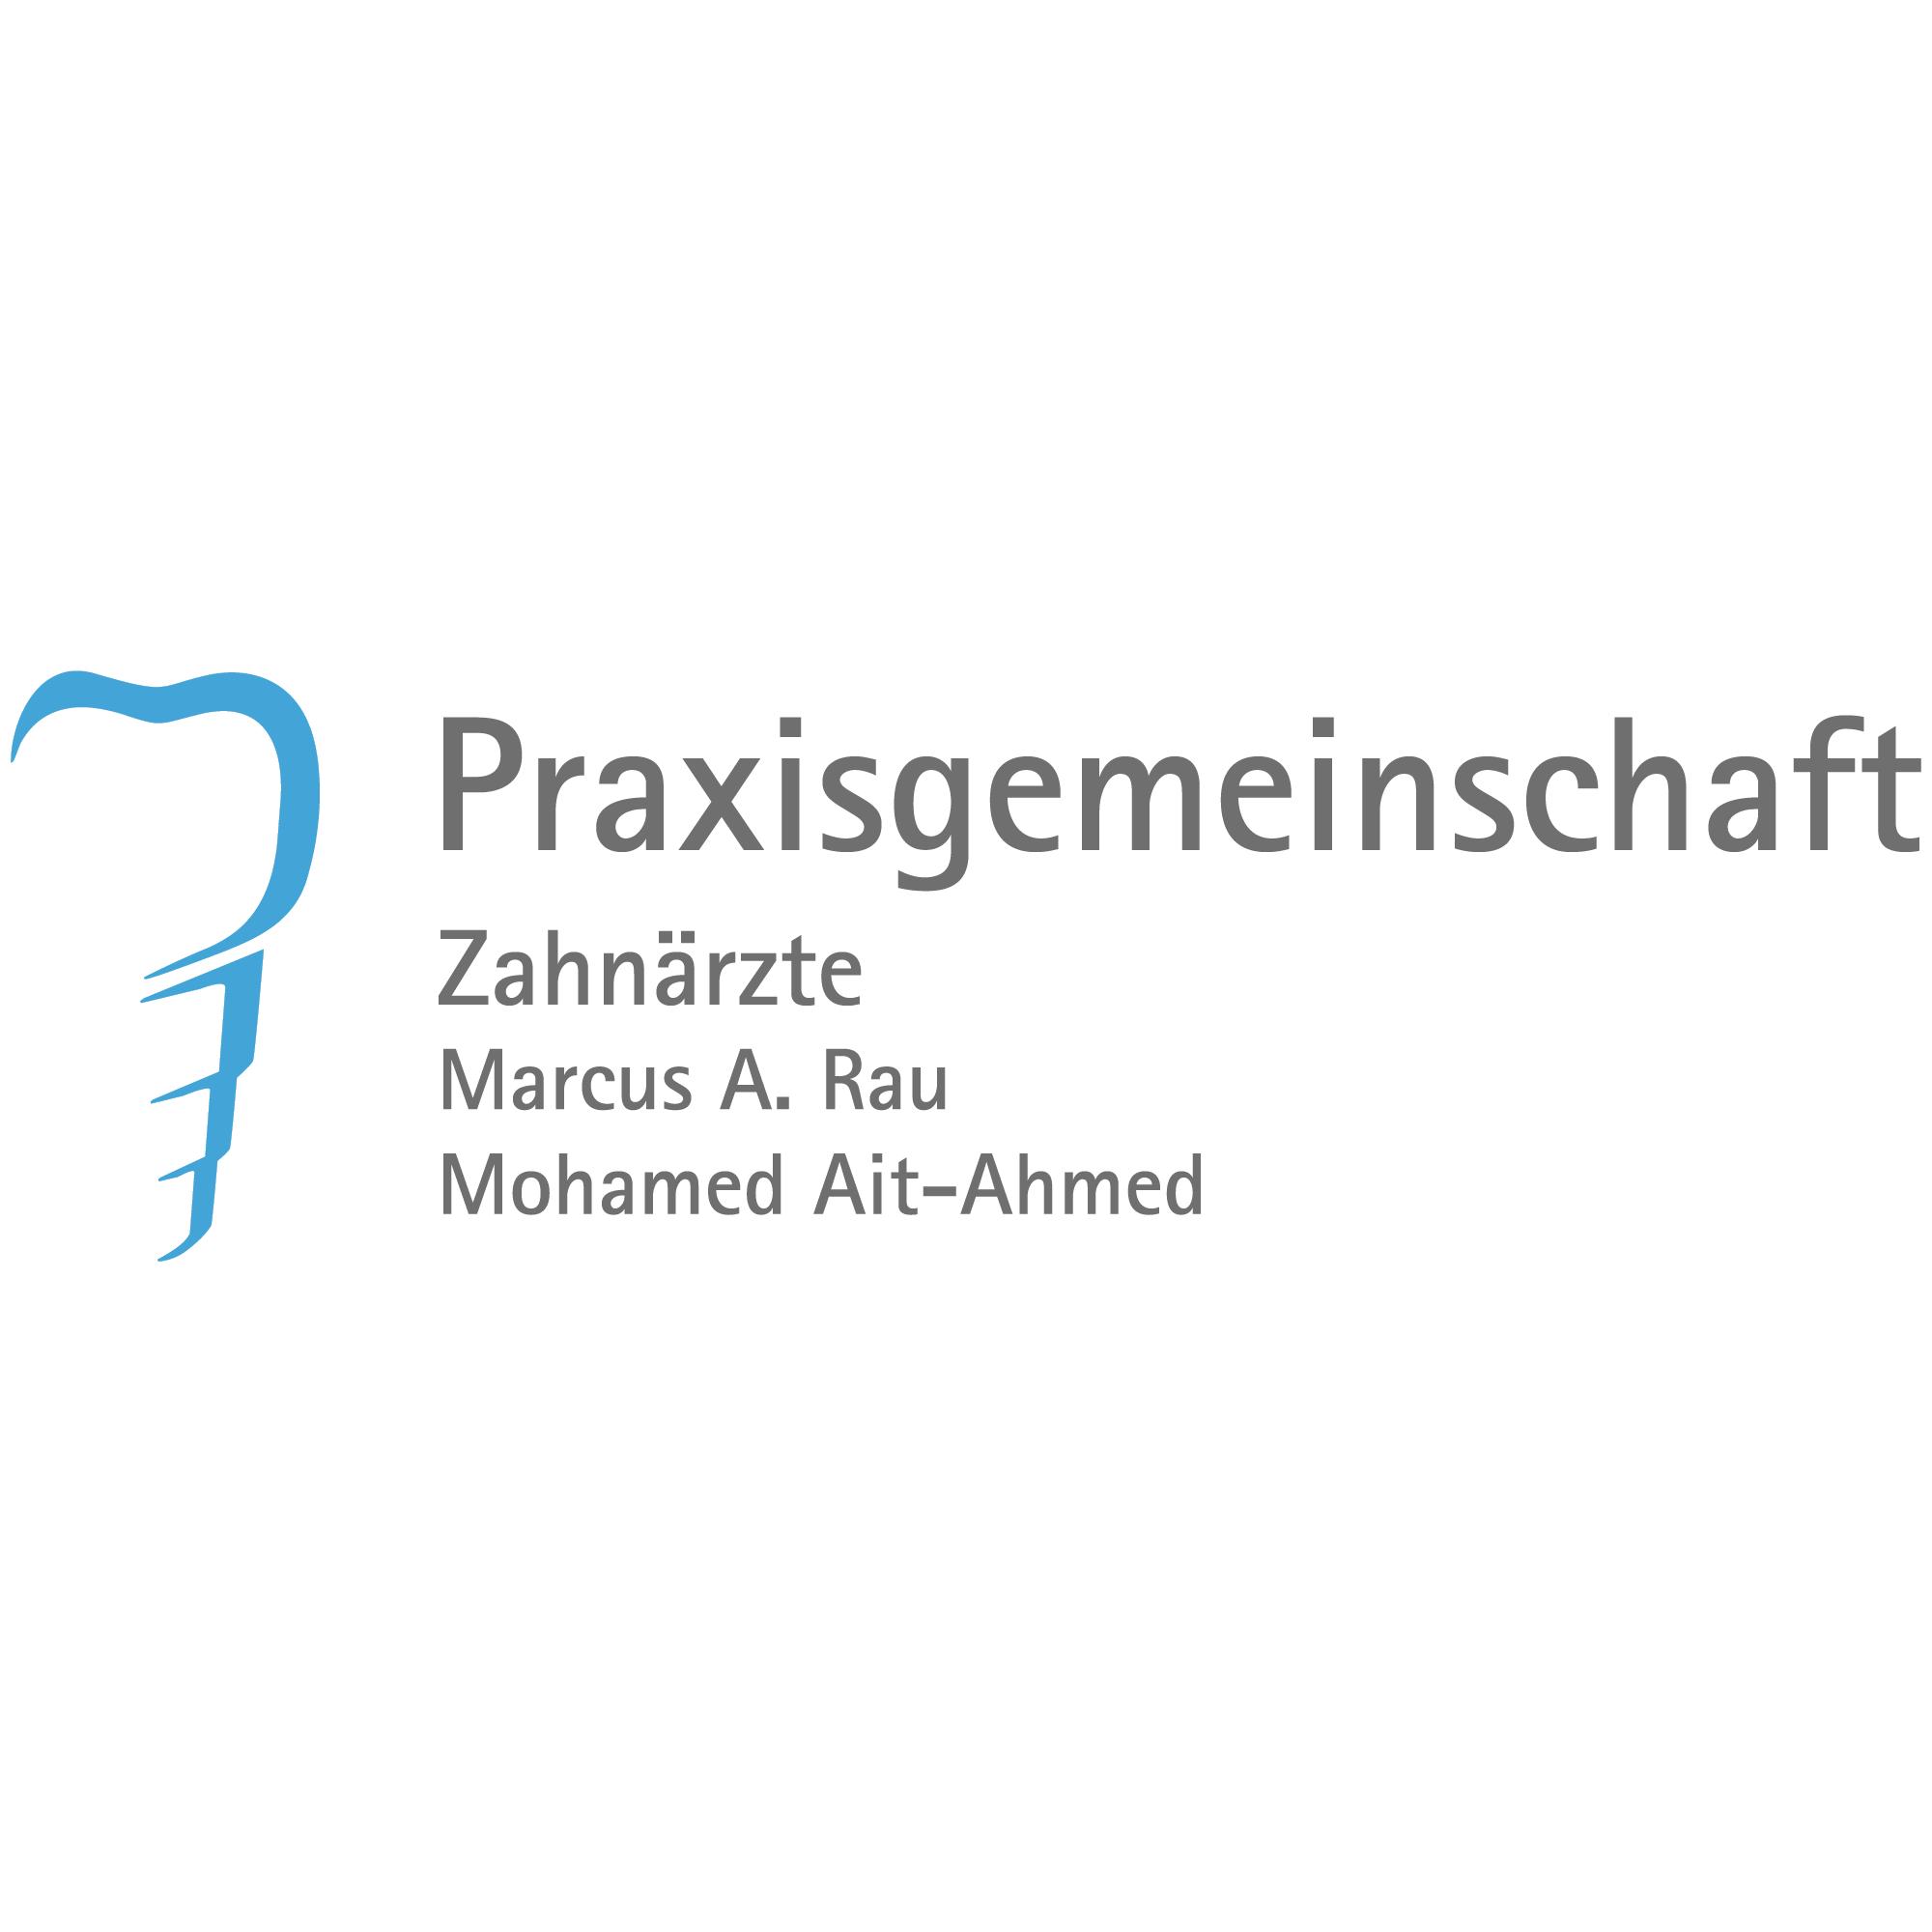 Bild zu Praxisgemeinschaft Zahnärzte Marcus A. Rau & Mohamed Ait-Ahmed in Neu Isenburg